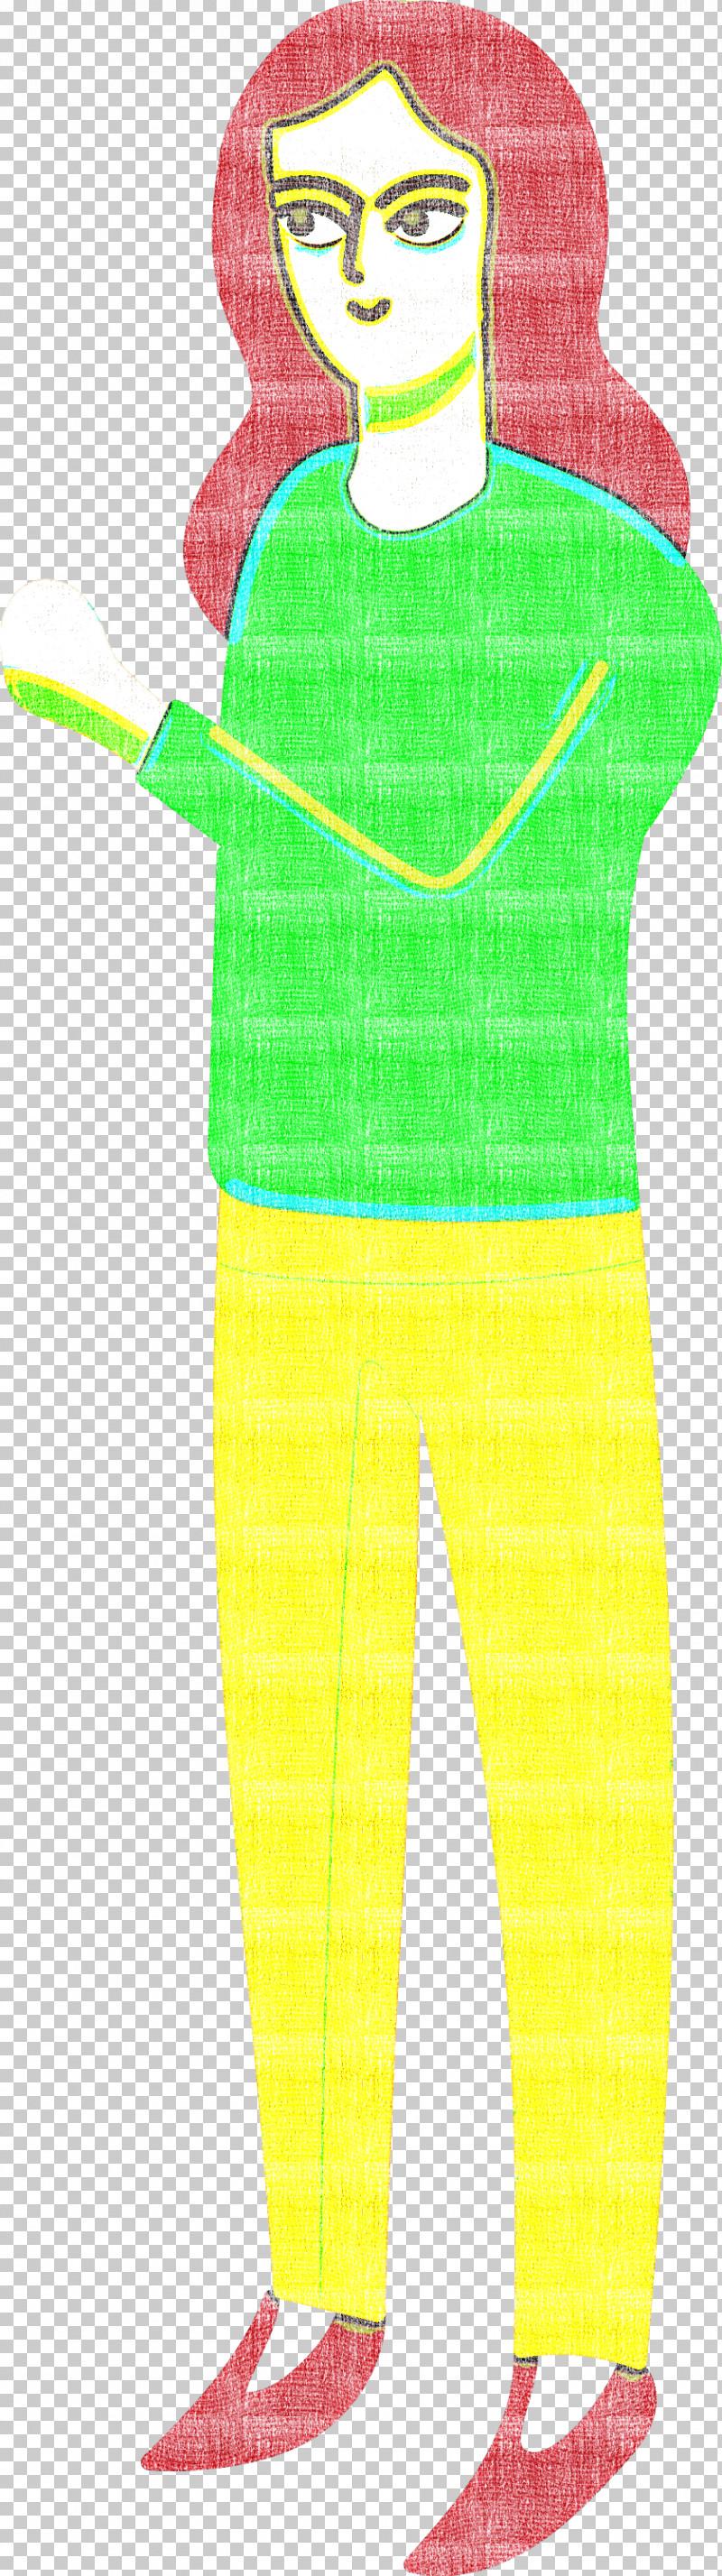 Costume Design Acos 美少女戦士セーラームーンcrystal オフィシャルコスチューム 区立芝公園中学校制服 女子 Mサイズ Headgear Cartoon Costume PNG, Clipart, Biology, Cartoon, Character, Costume, Costume Design Free PNG Download